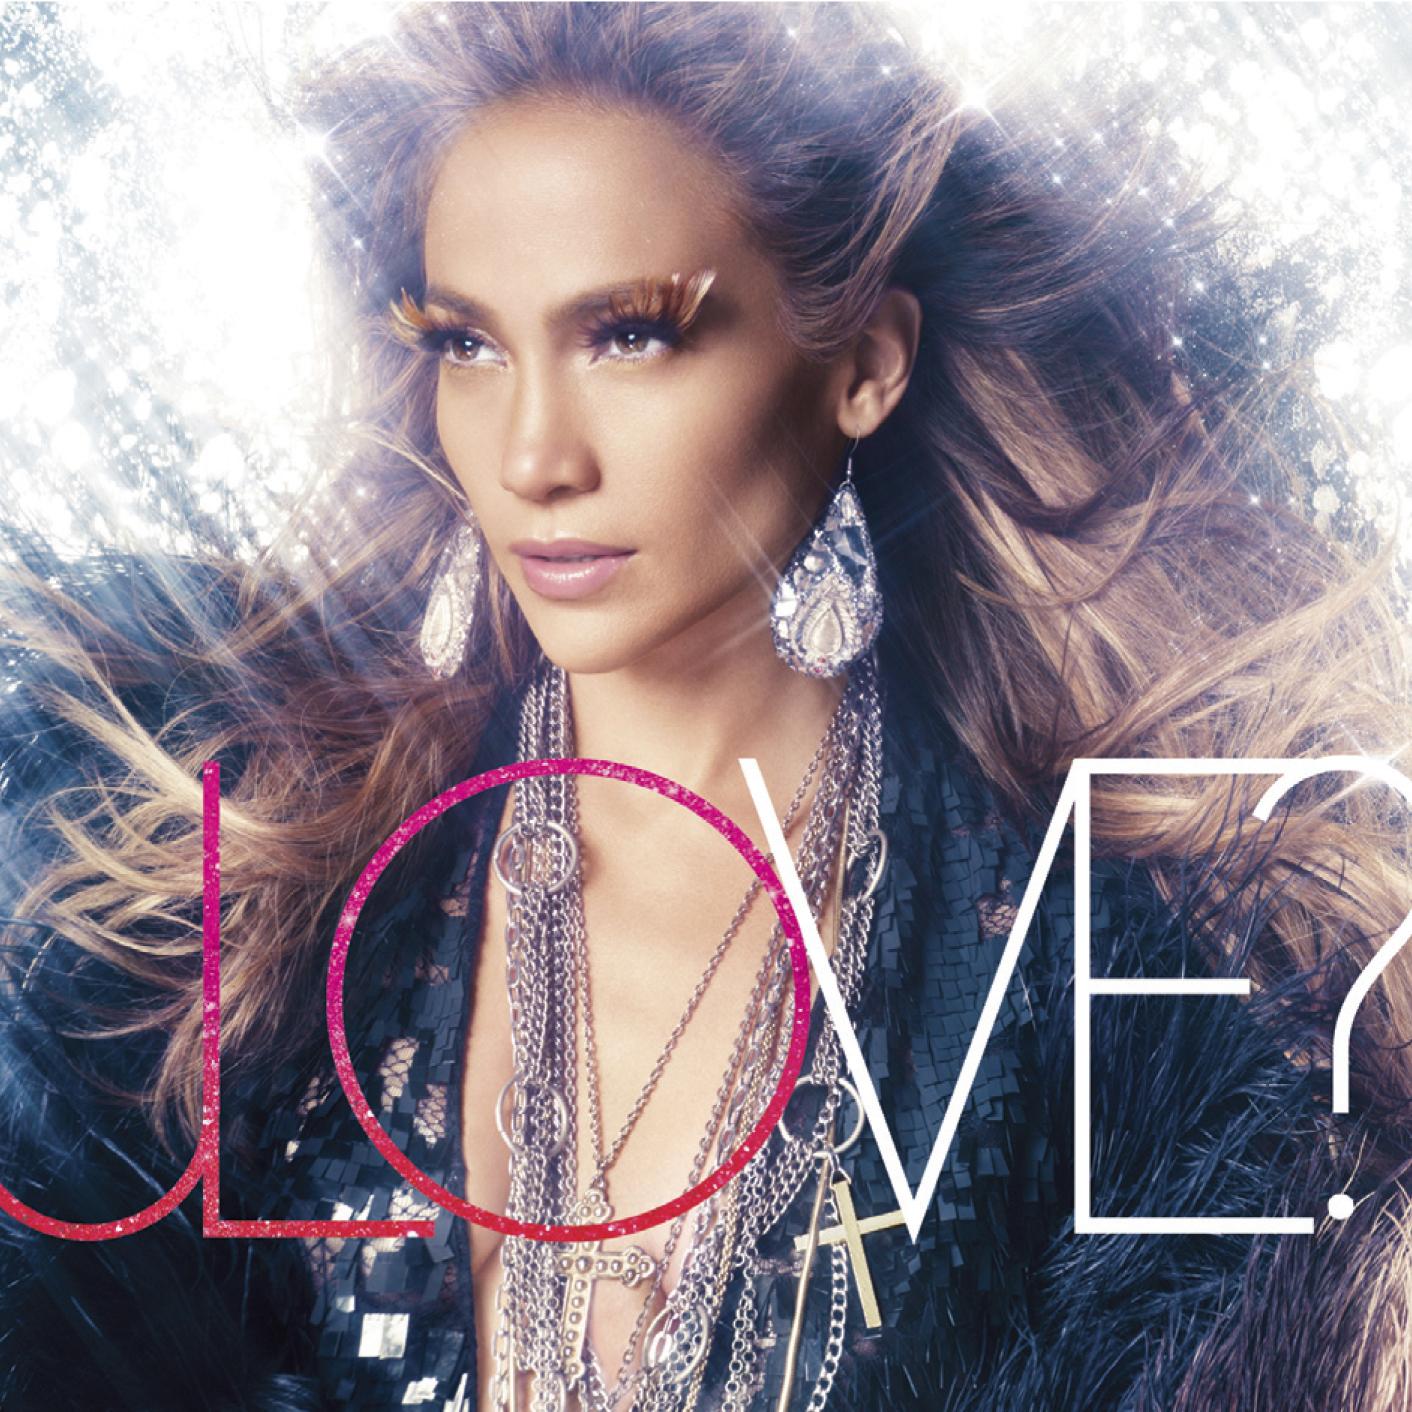 http://1.bp.blogspot.com/-PRwJkNKp4gc/TcgDmYgnWGI/AAAAAAAAACI/iHfe4AcMZkE/s1600/Jennifer_Lopez_-_Love.jpg